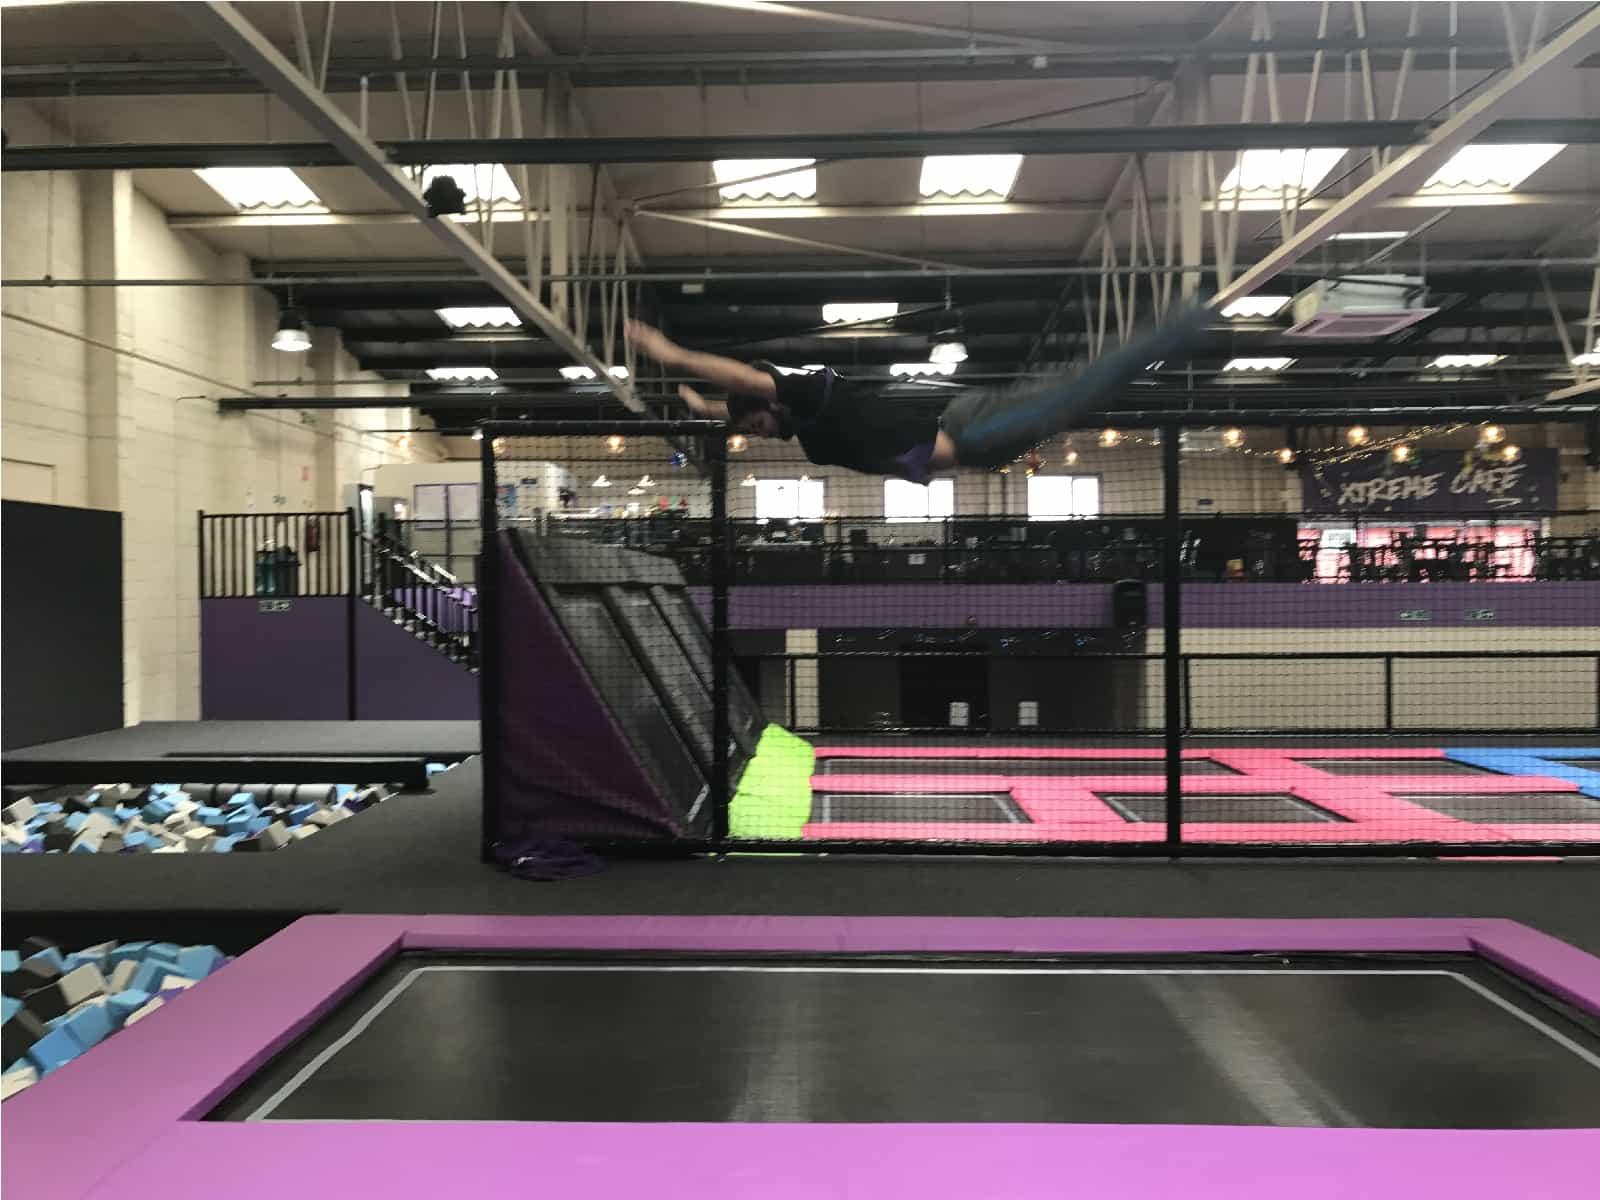 xtreme360 trampoline park cambridge. Black Bedroom Furniture Sets. Home Design Ideas